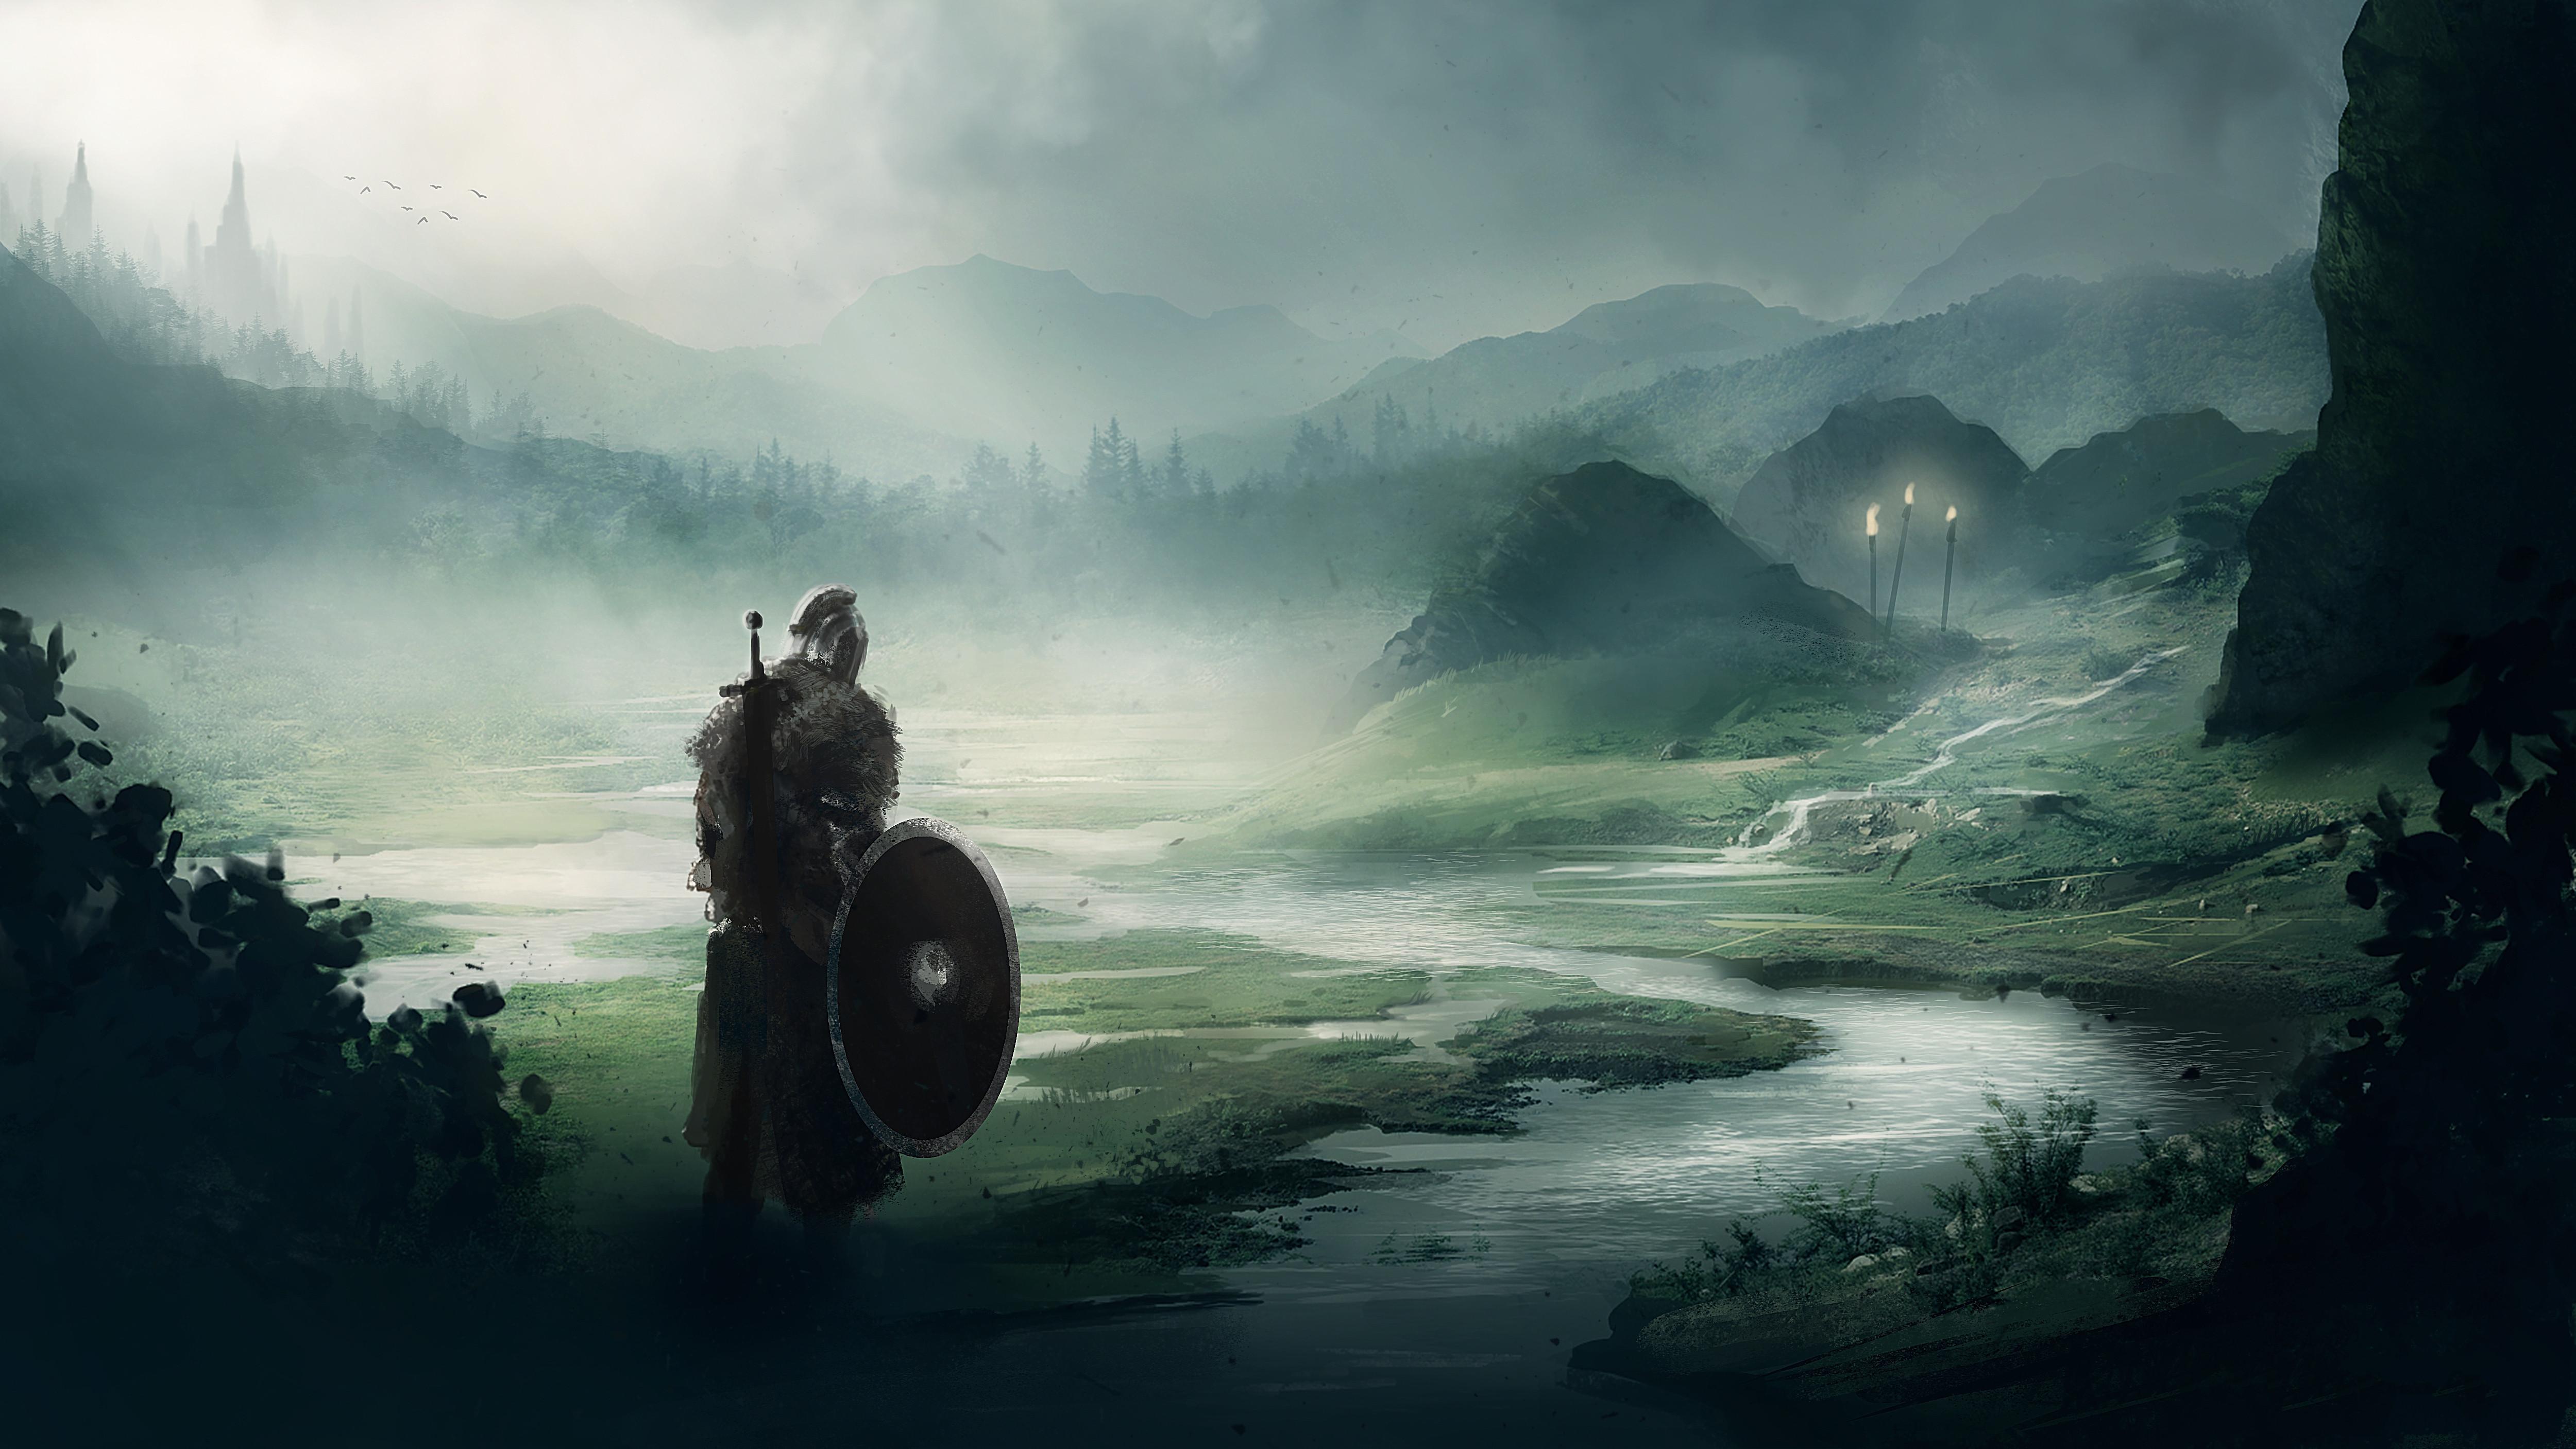 Dark Souls 3 Fan Art Hd Games 4k Wallpapers Images Backgrounds